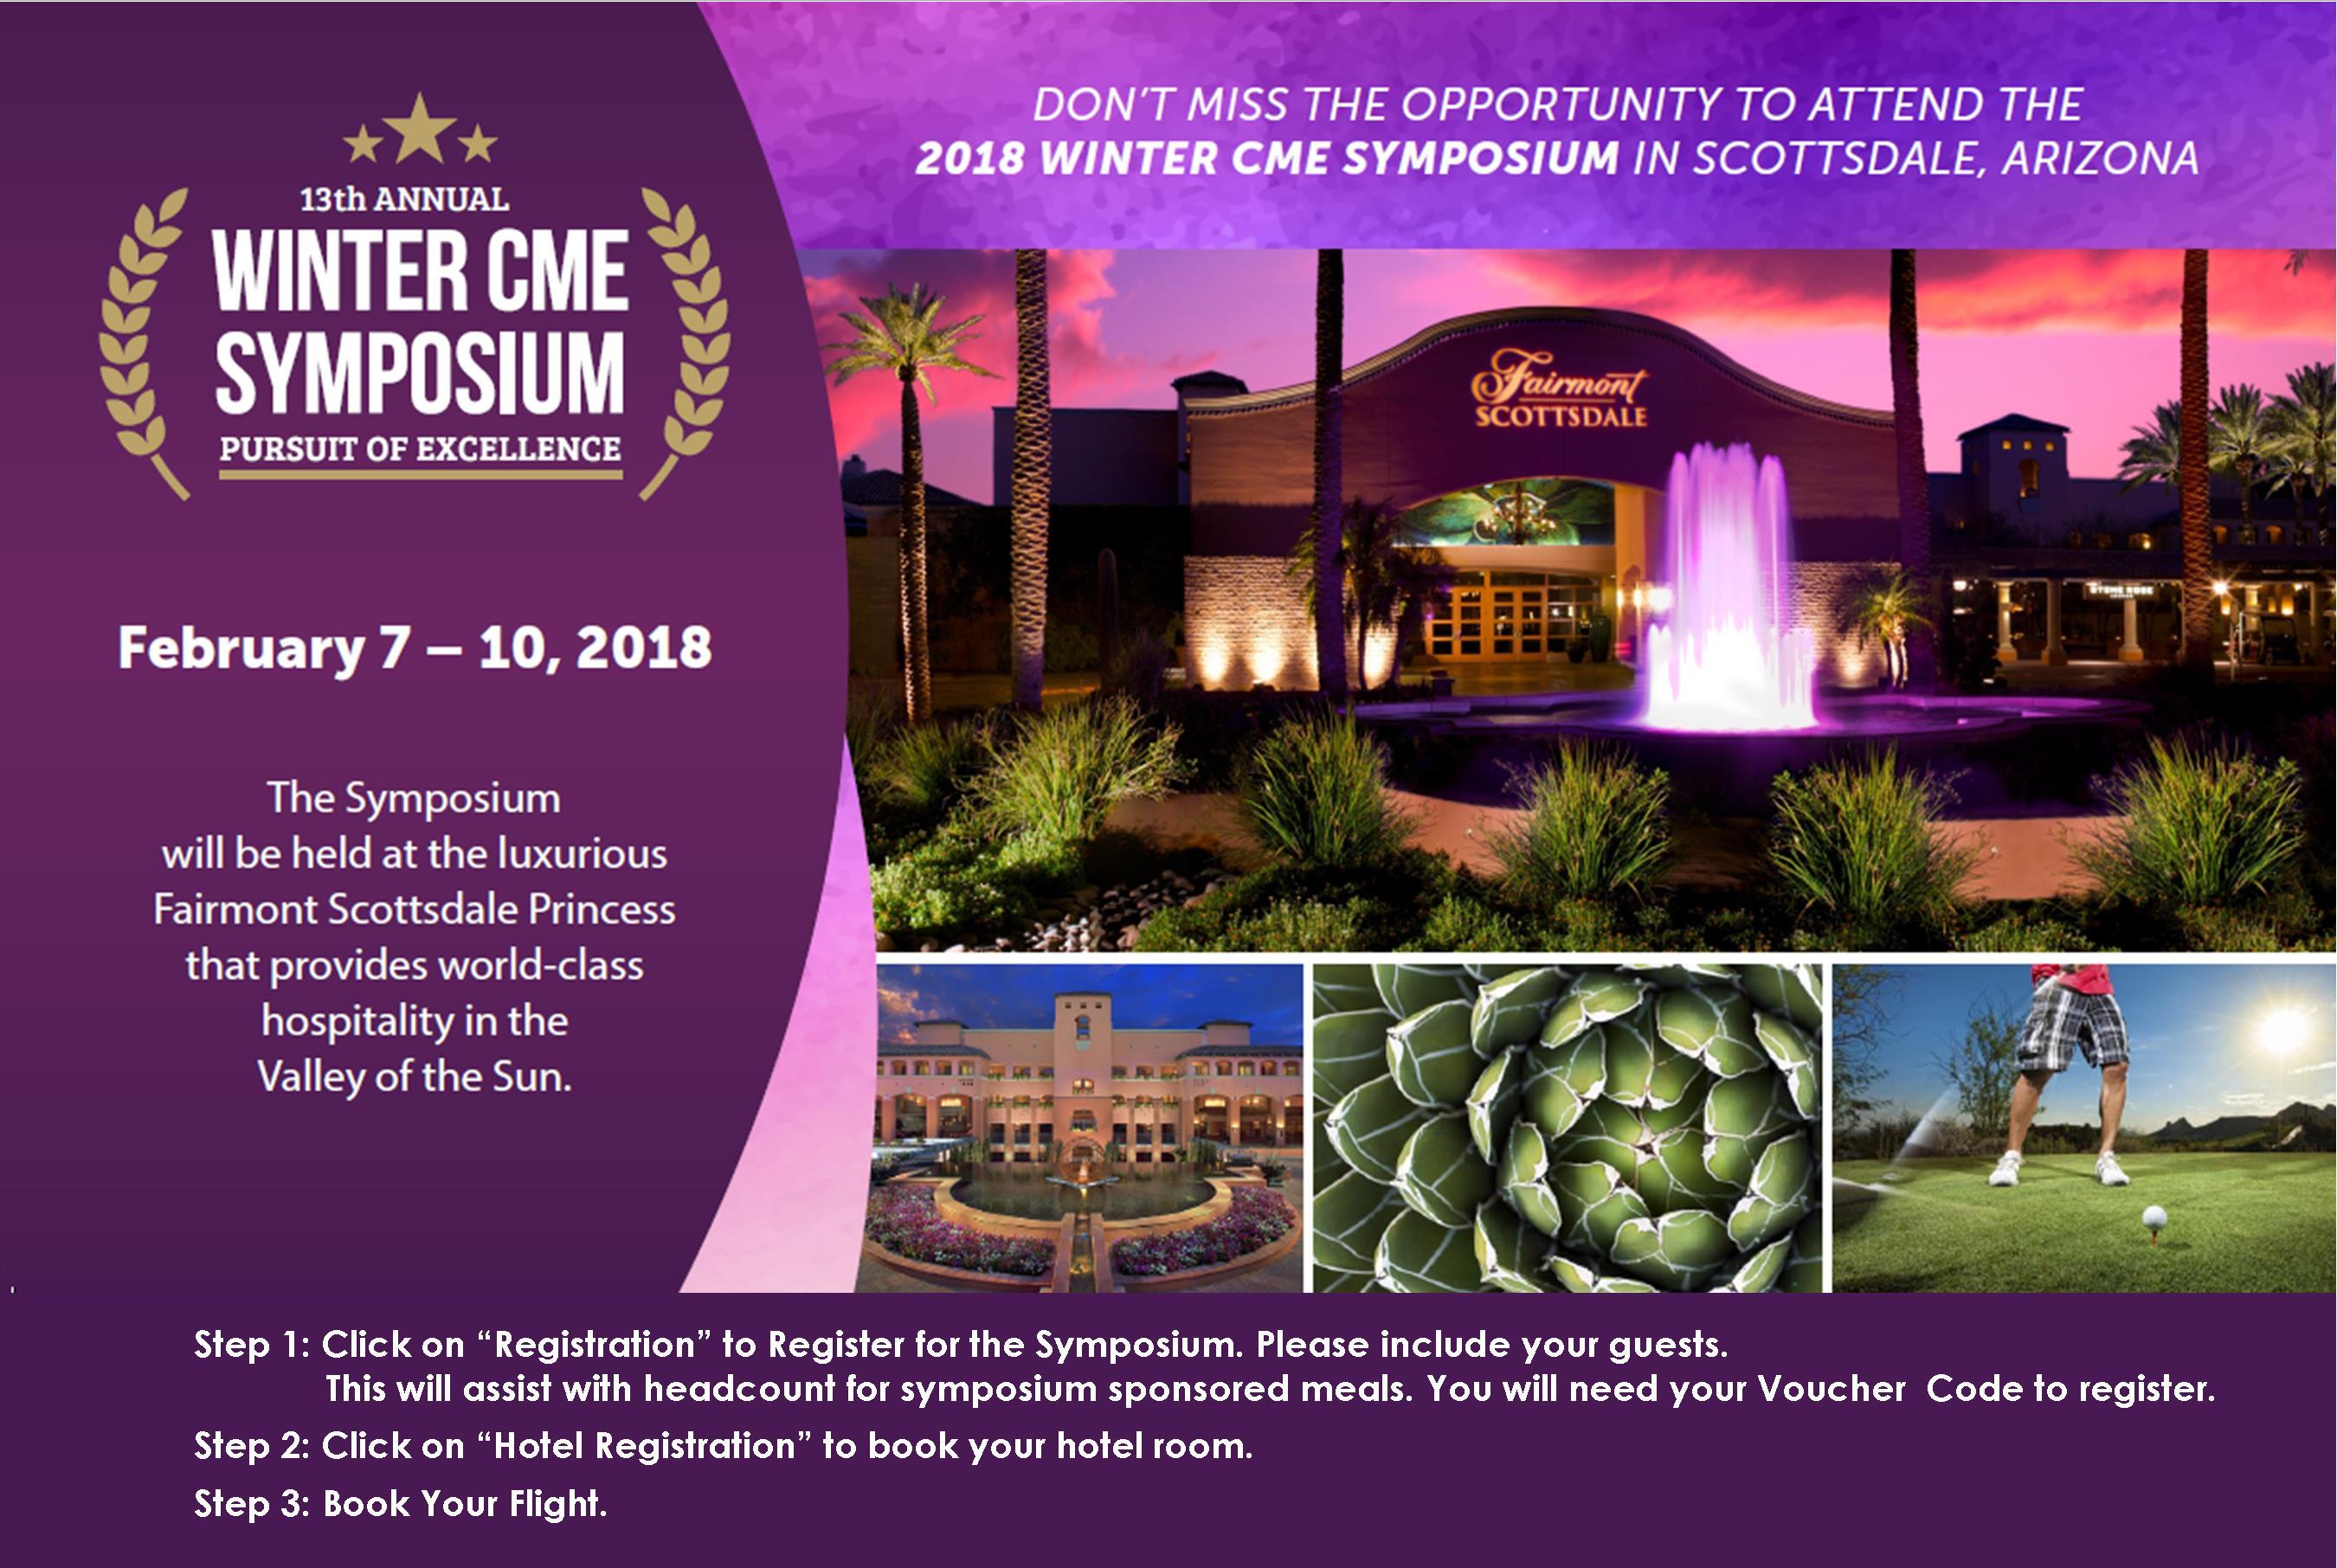 13th Annual Winter CME Symposium